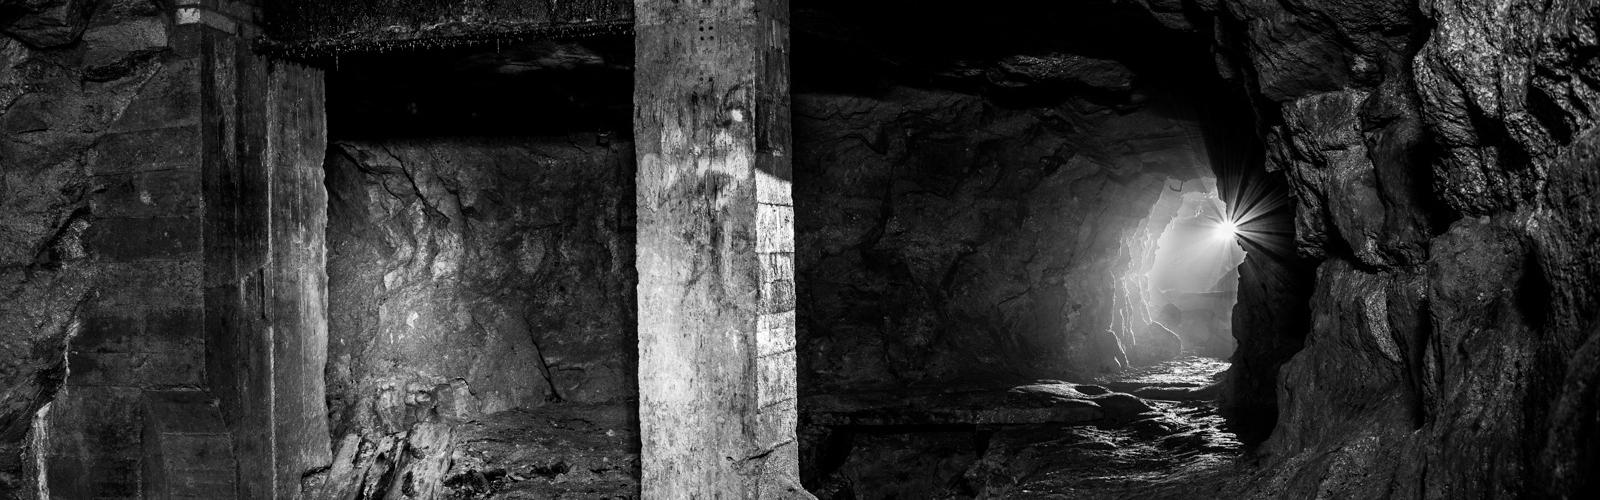 Hidden in Plain Sight, a 21st Century photographic journey into Cornish mines.